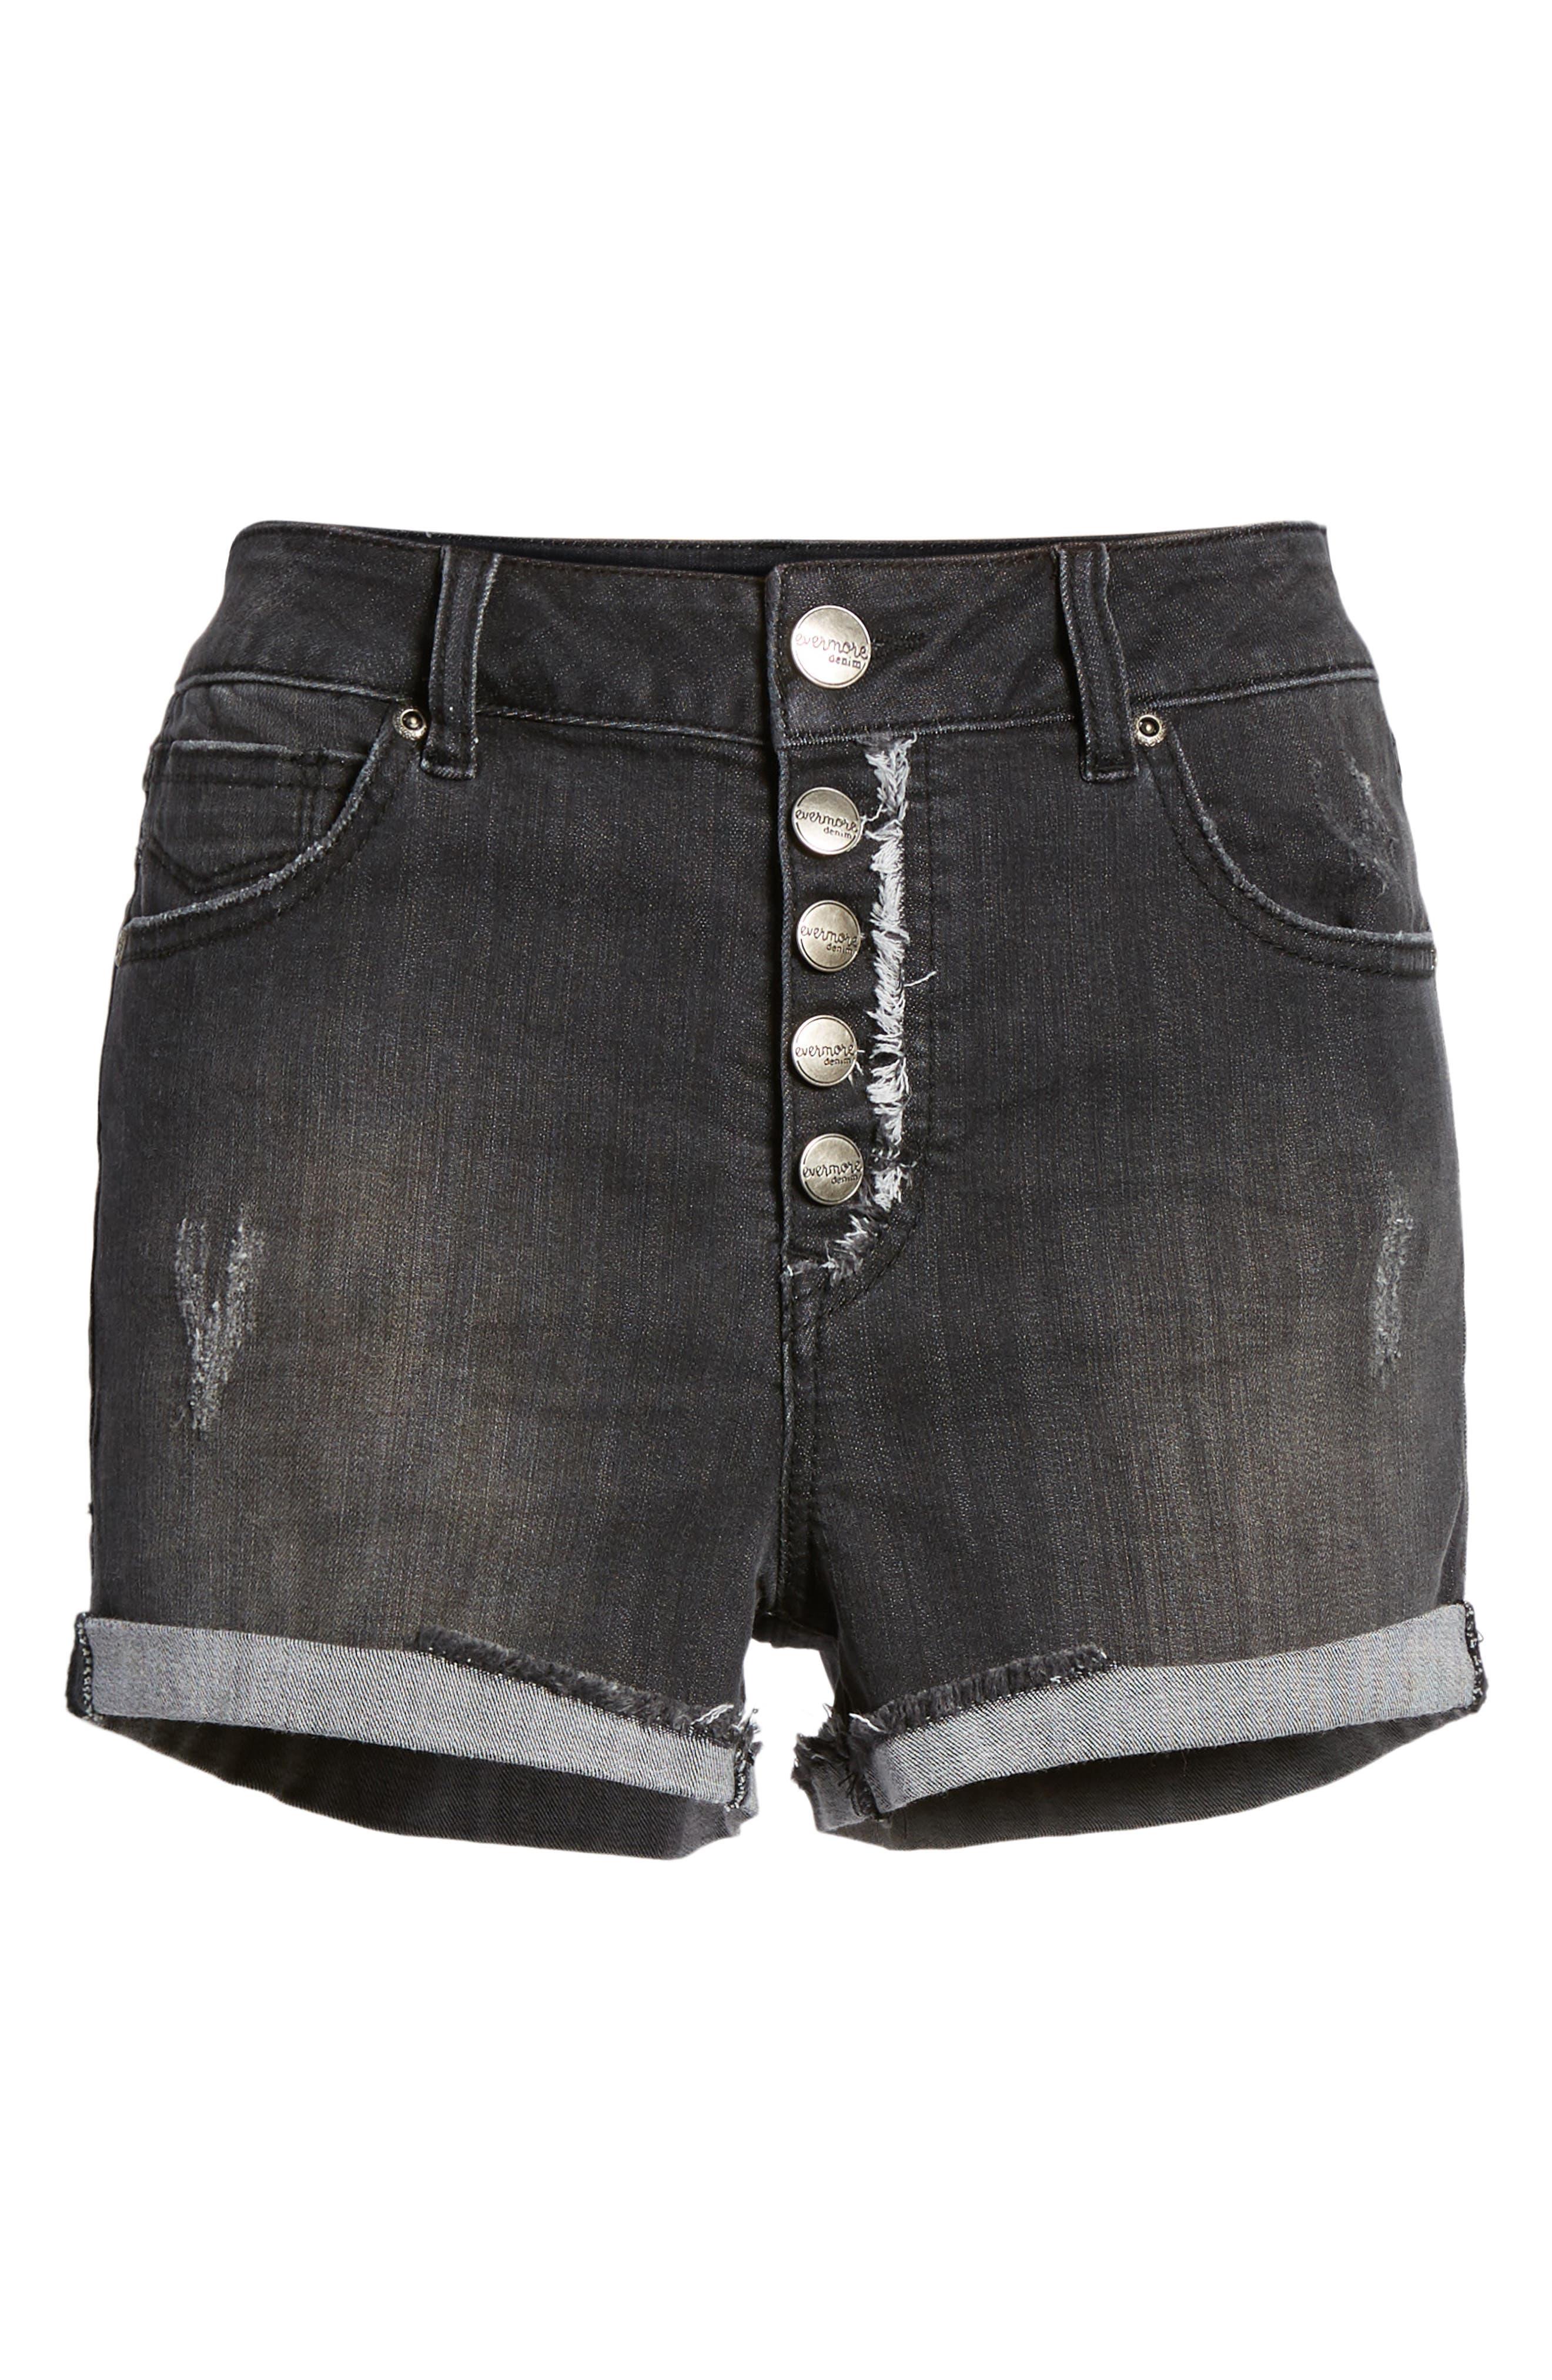 1822 DENIM,                             Cuffed Button Fly Denim Shorts,                             Alternate thumbnail 7, color,                             400